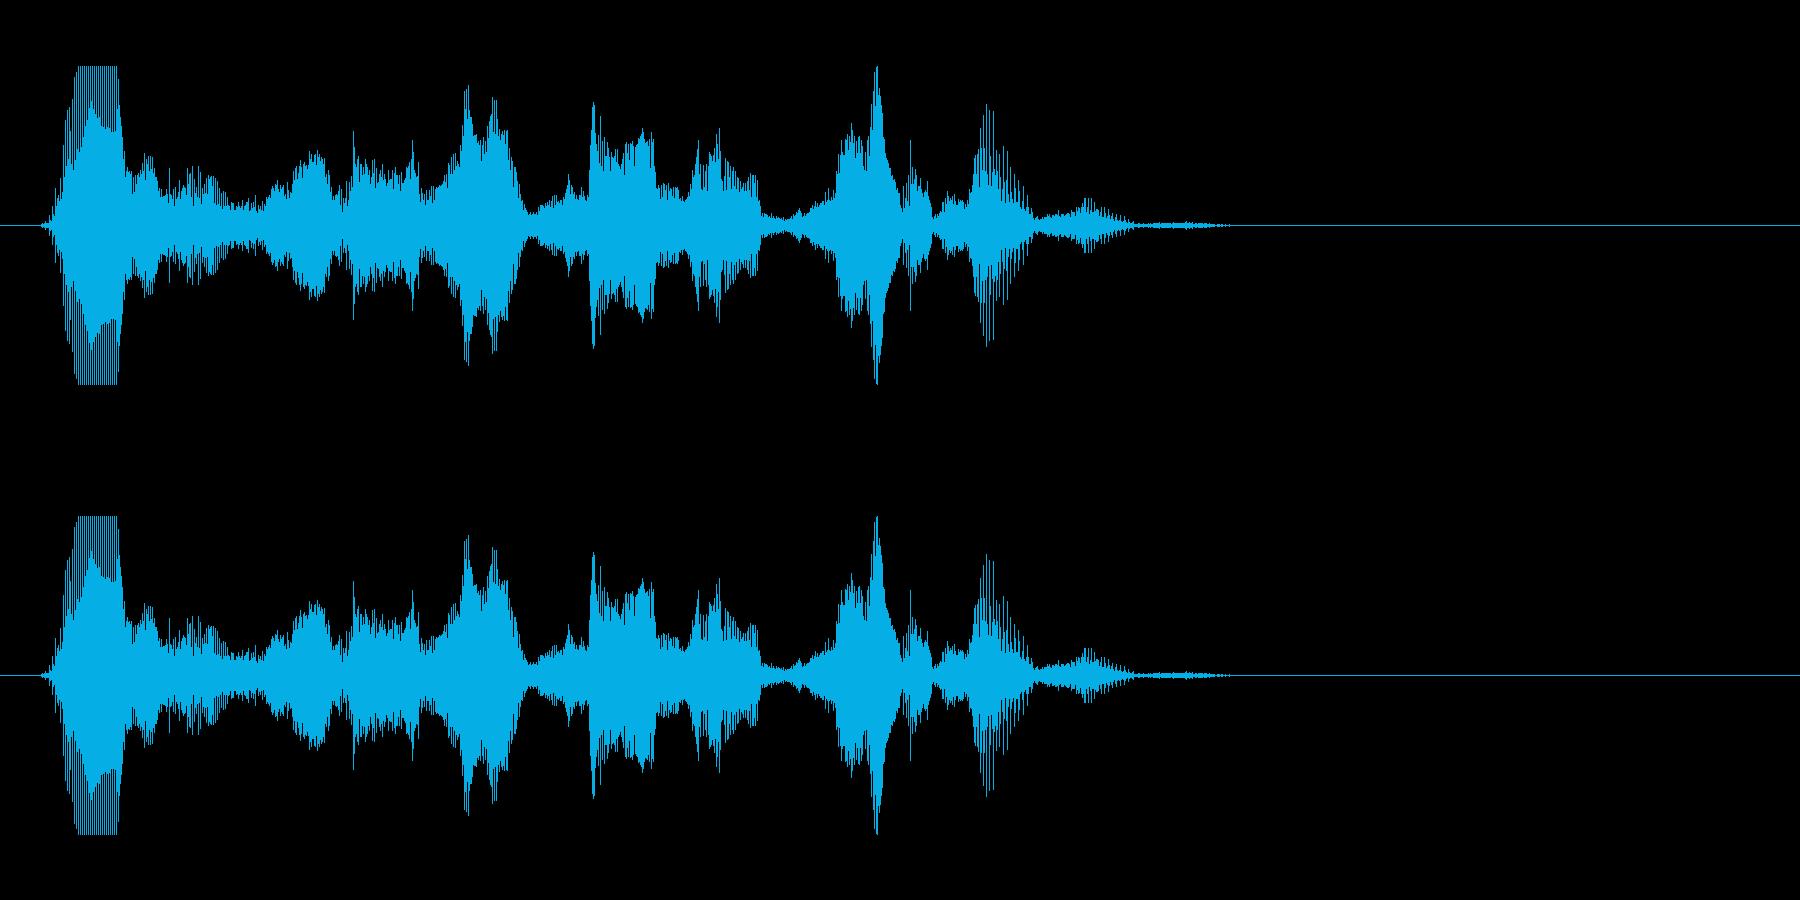 MERRY XMASS LIVEver's reproduced waveform